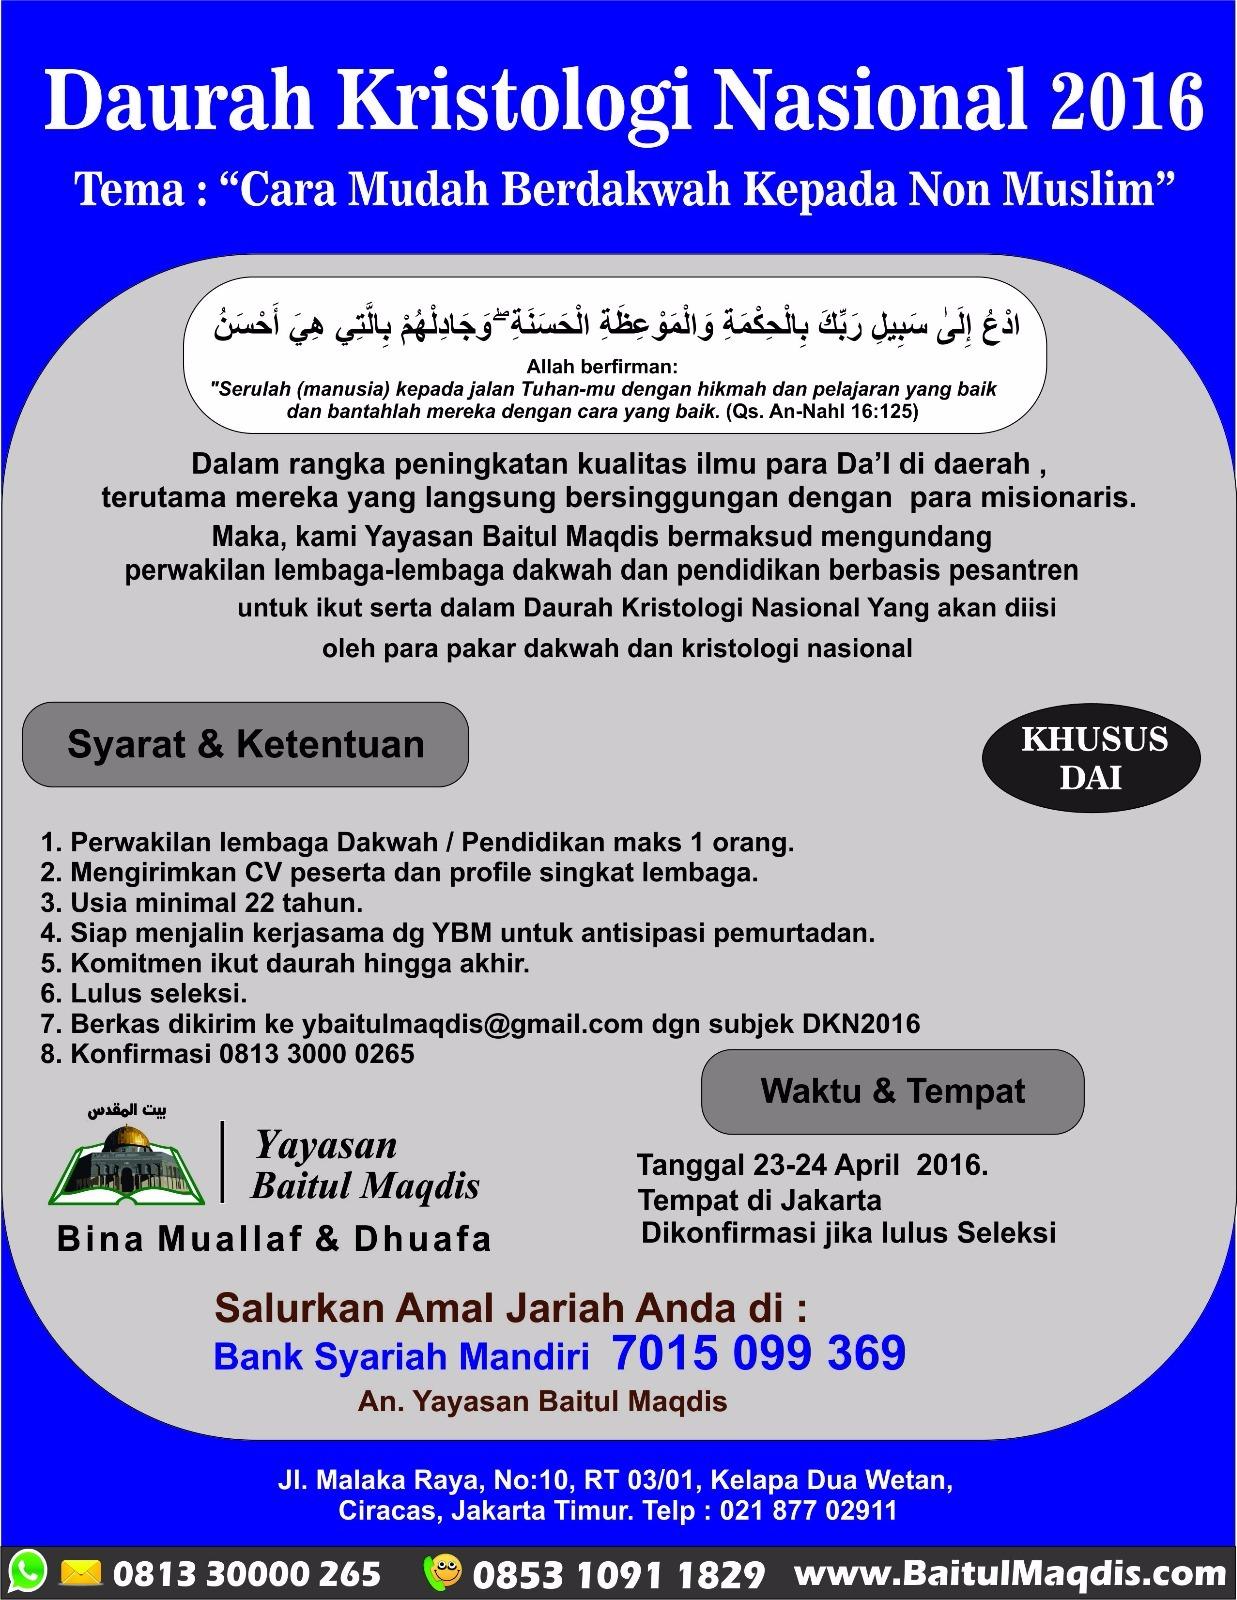 Brosur Daurah Kristologi Nasional Yayasan Baitul Maqdis.